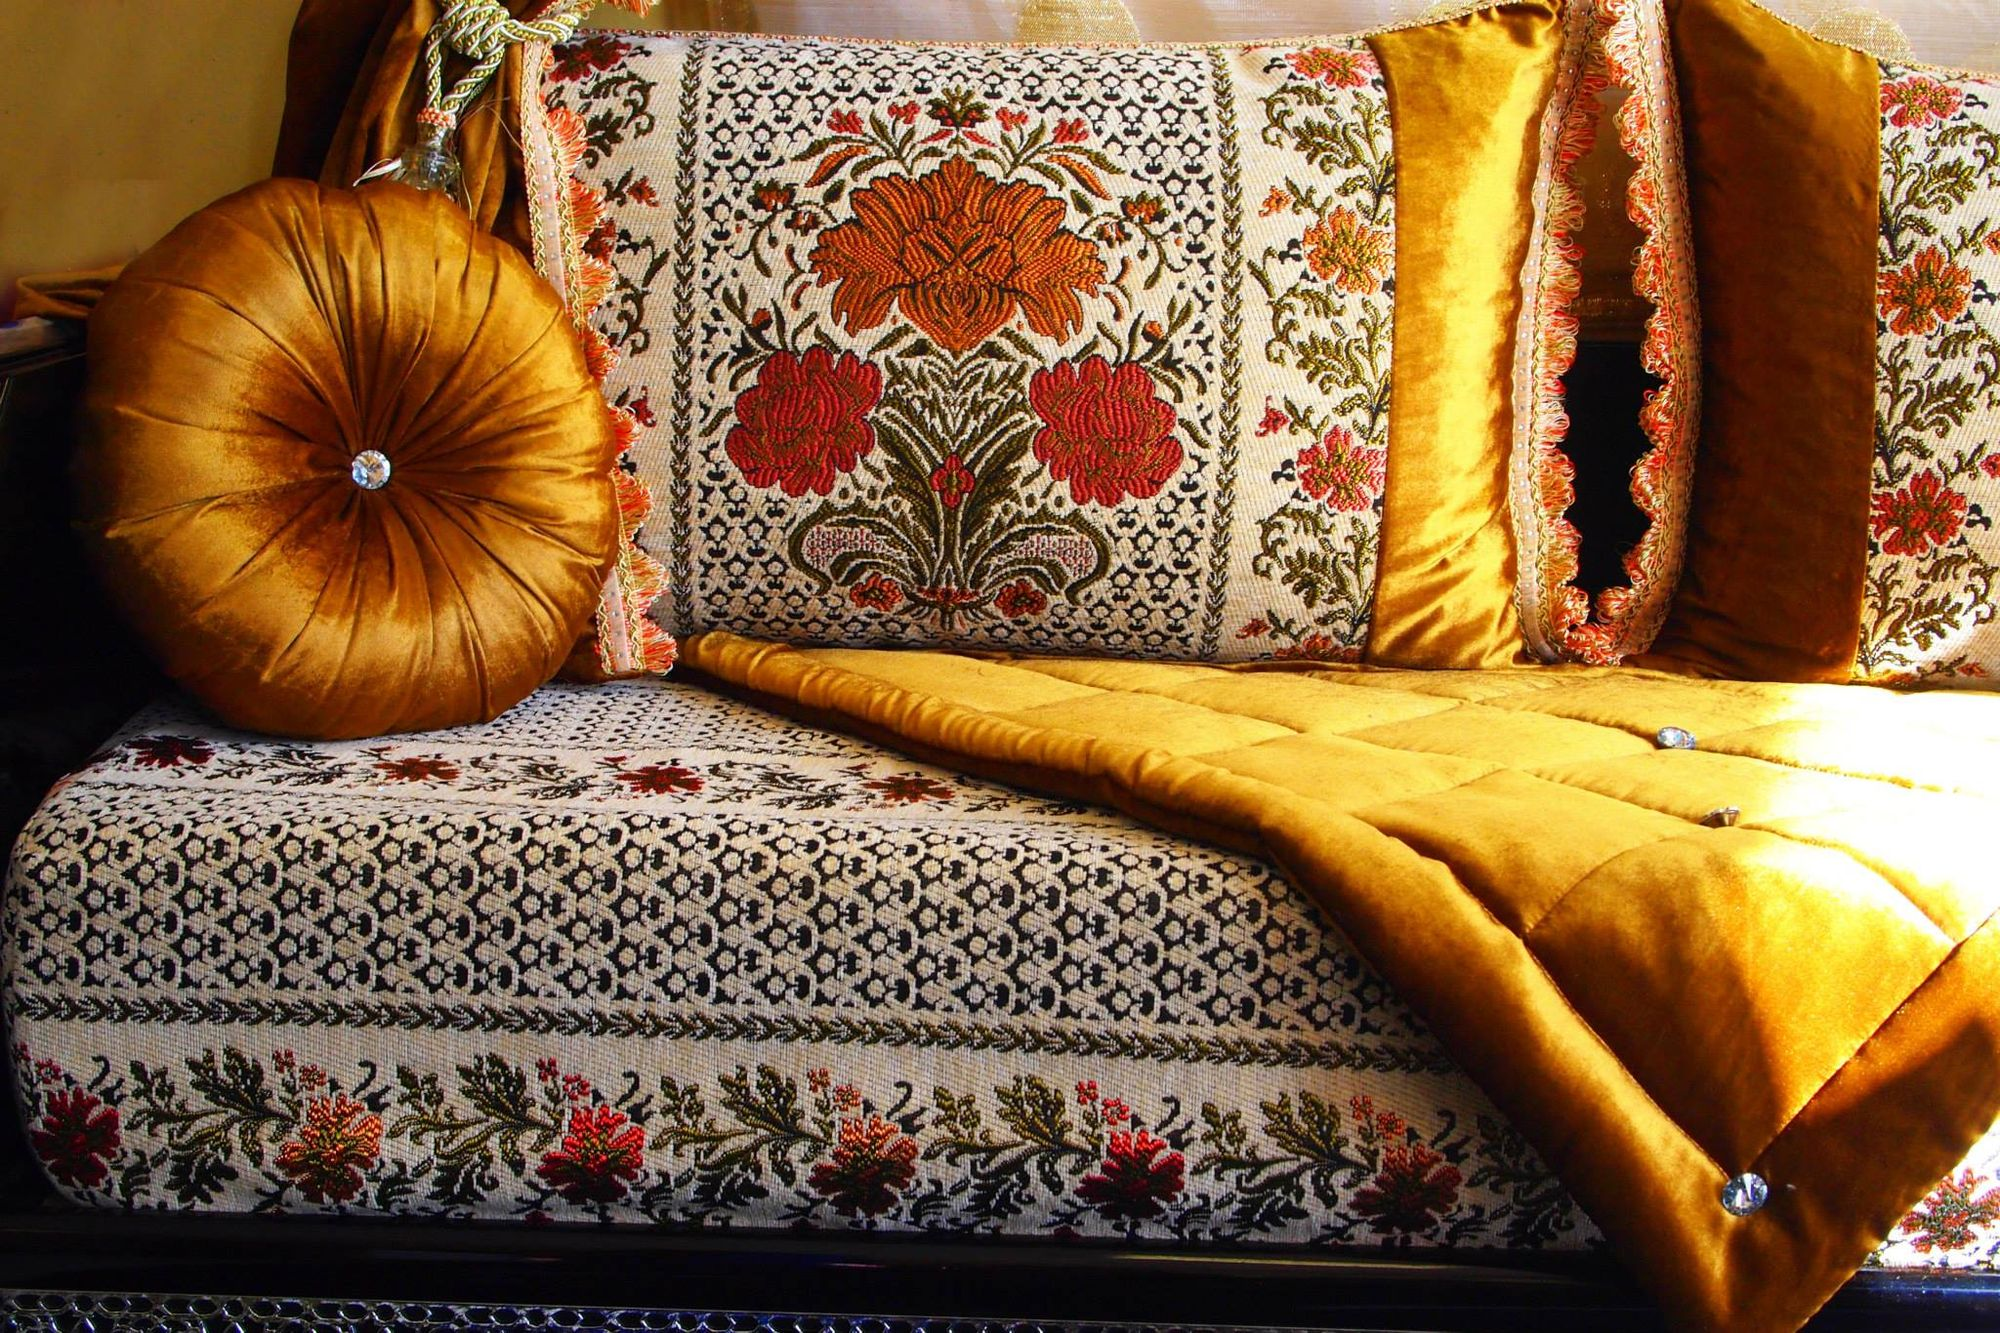 Housse Salon Marocain | Les Salon Marocain Moderne 2017